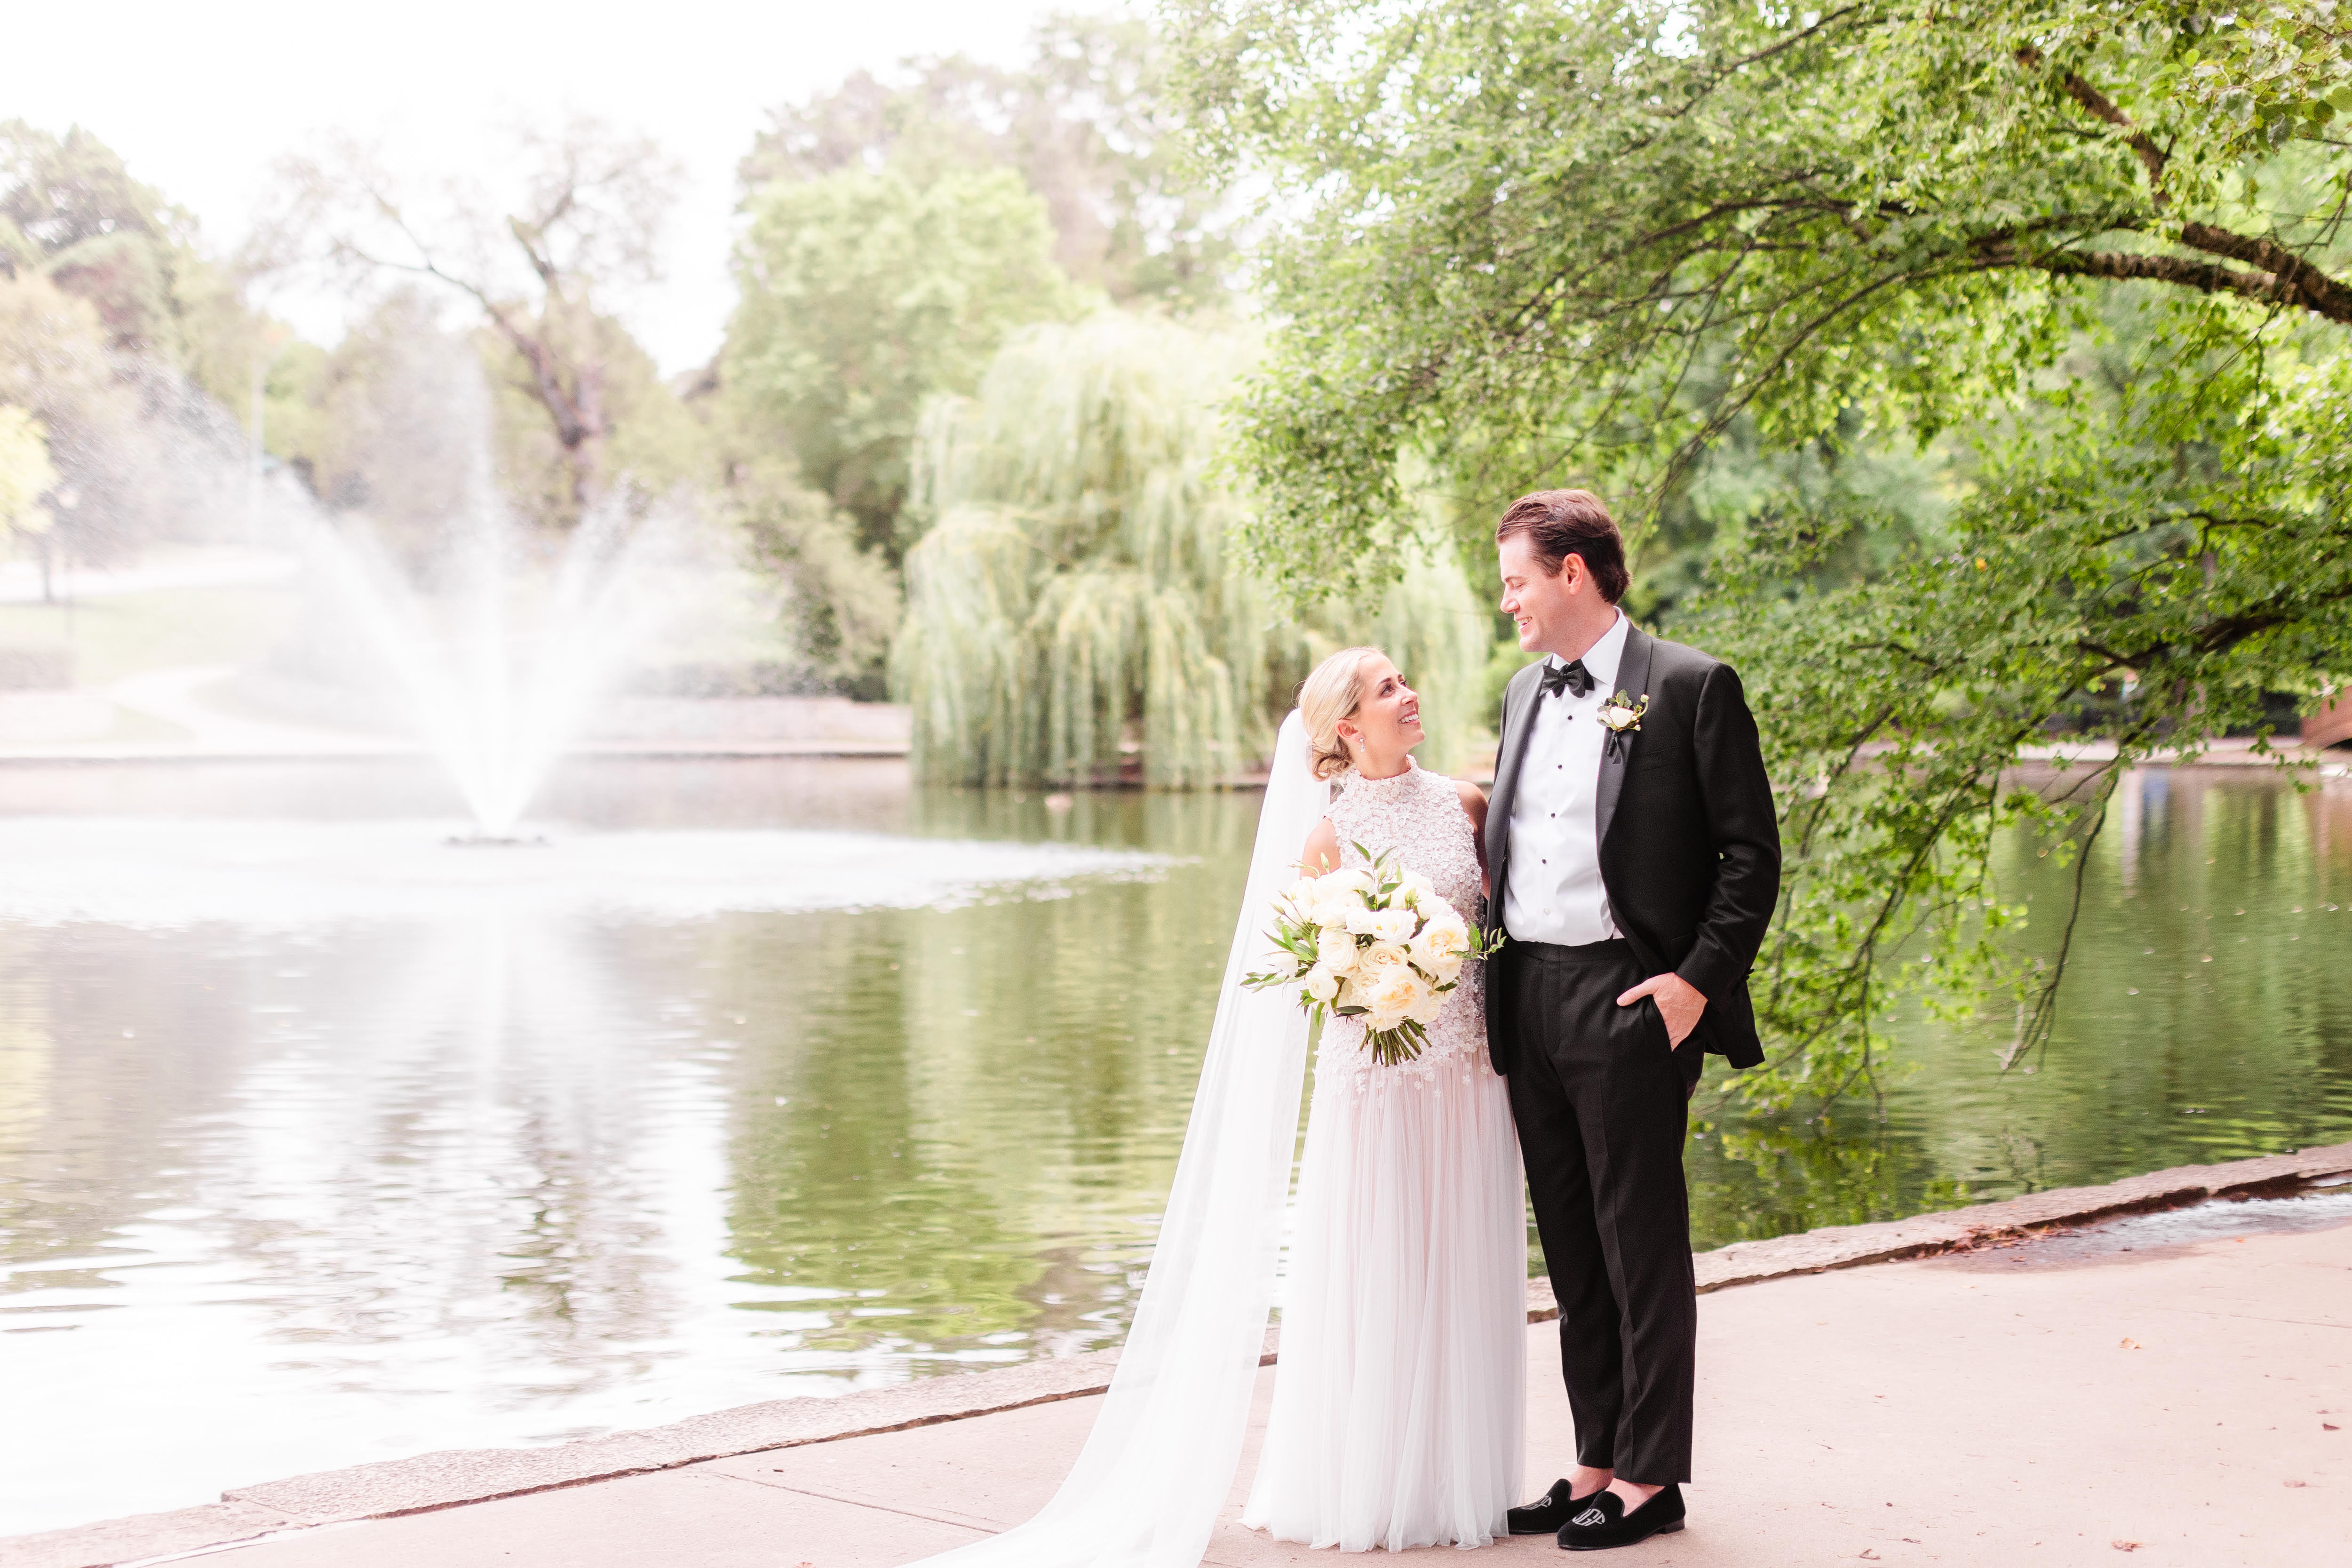 Congratulations, Abby & James!